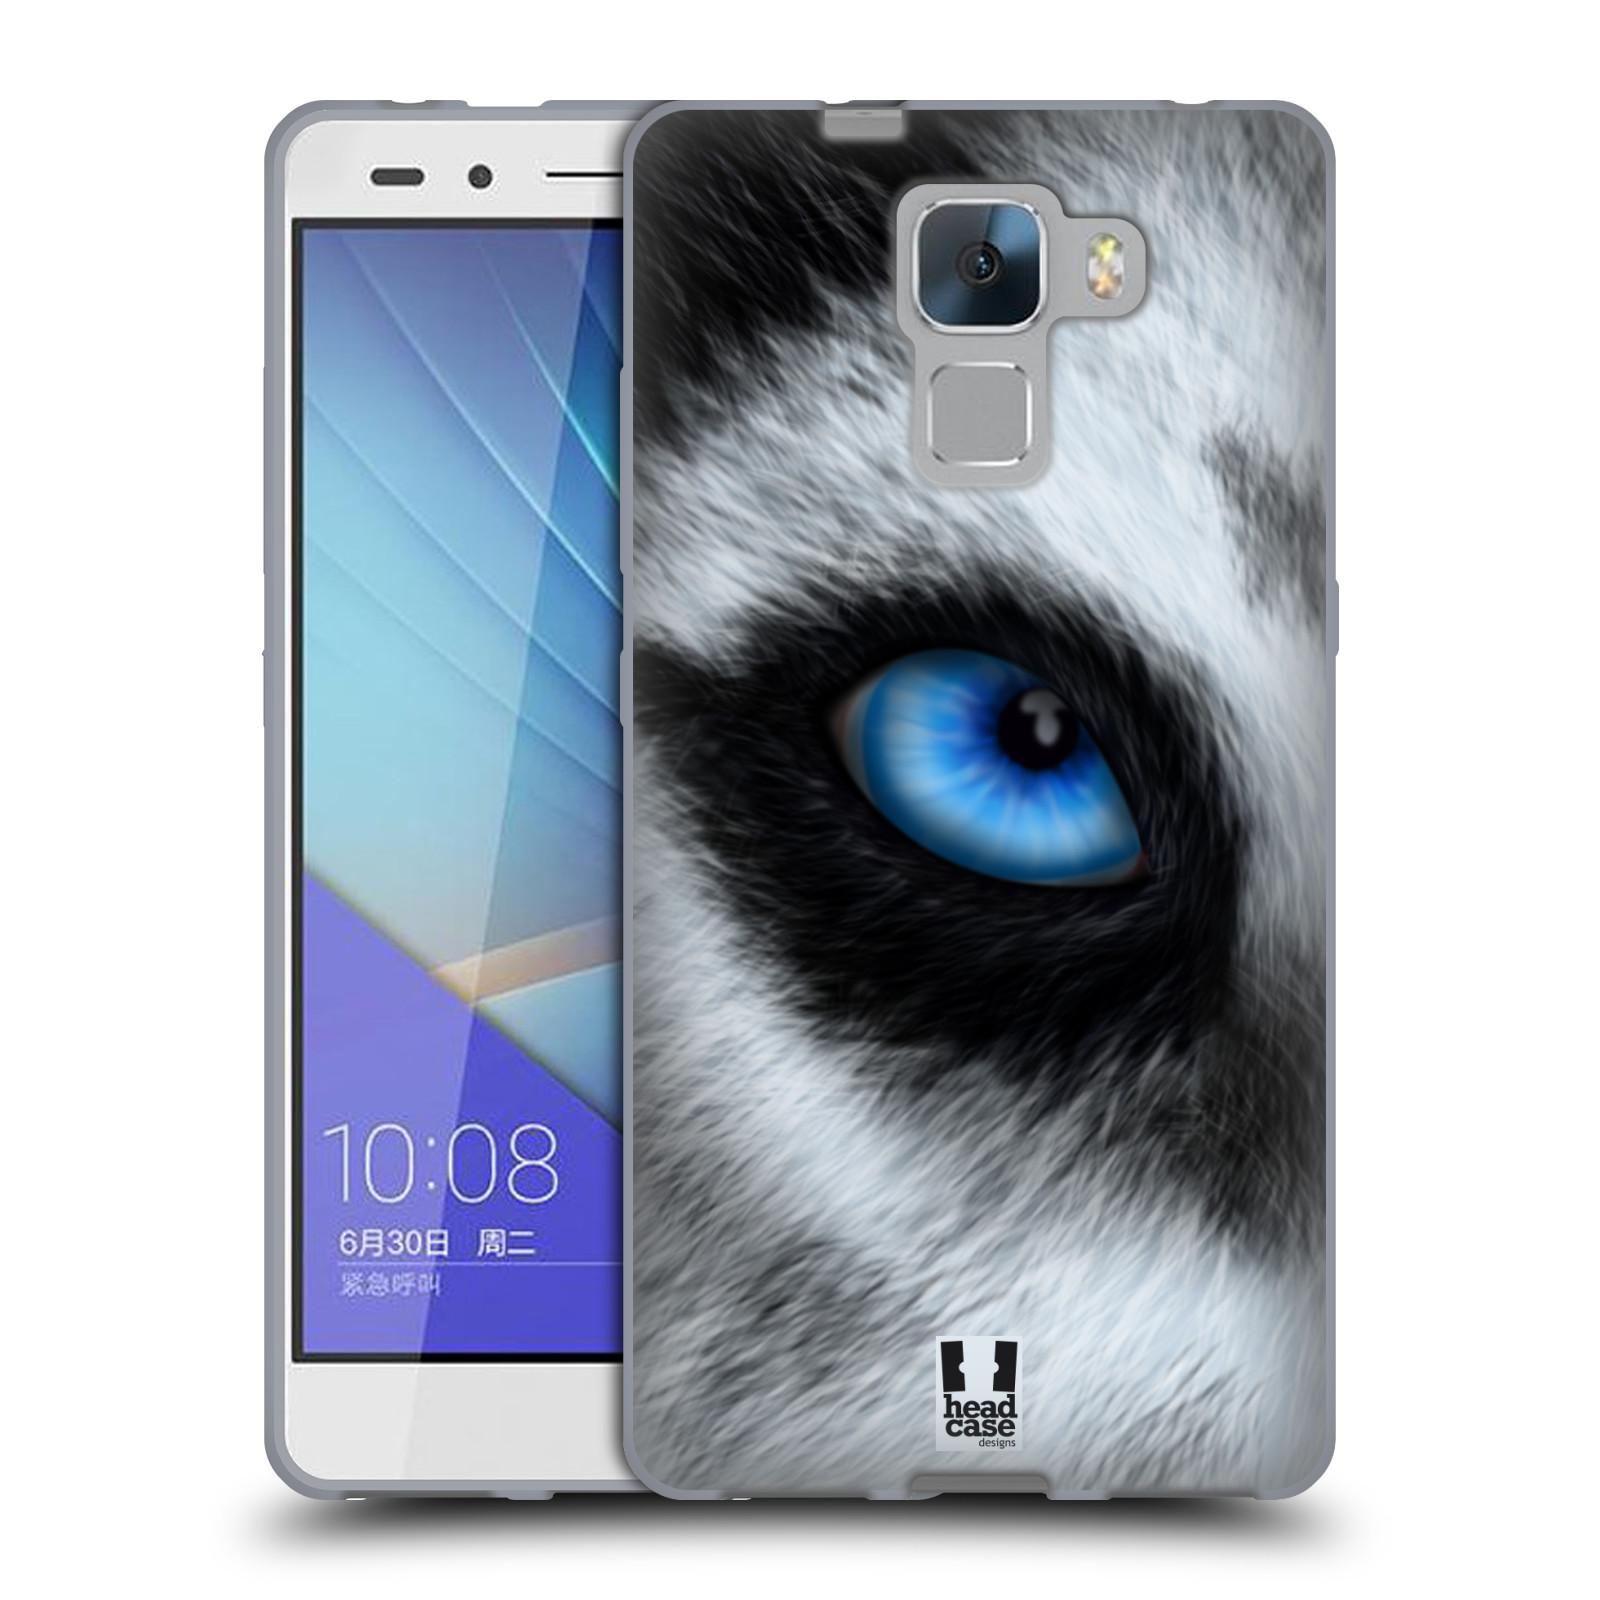 HEAD CASE silikonový obal na mobil HUAWEI HONOR 7 vzor pohled zvířete oko pes husky